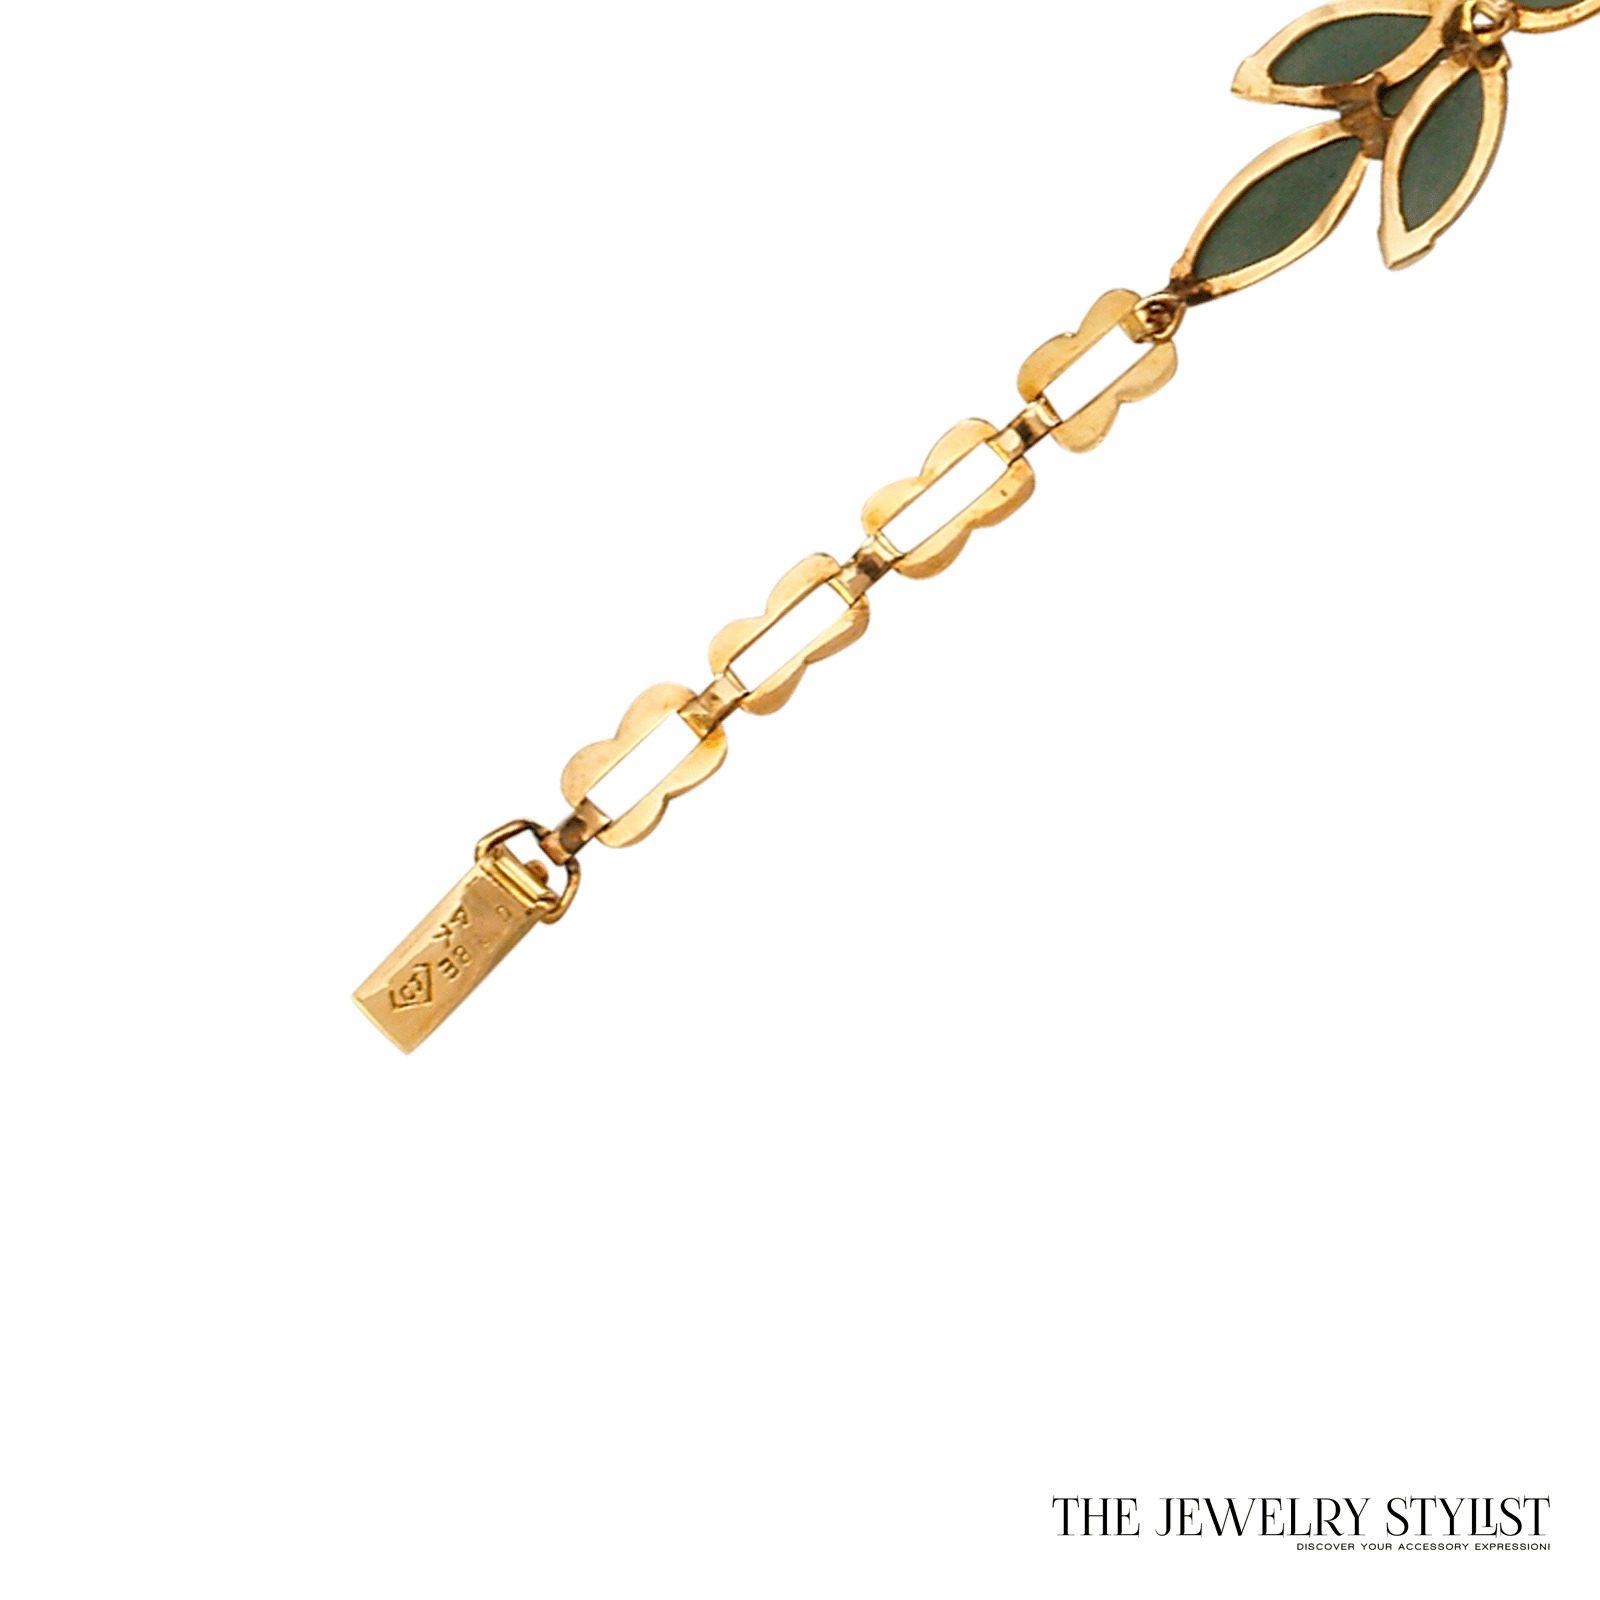 Vintage 14k Caribe Genuine Jade Bracelet. Beautiful 14k link jade bracelet mark